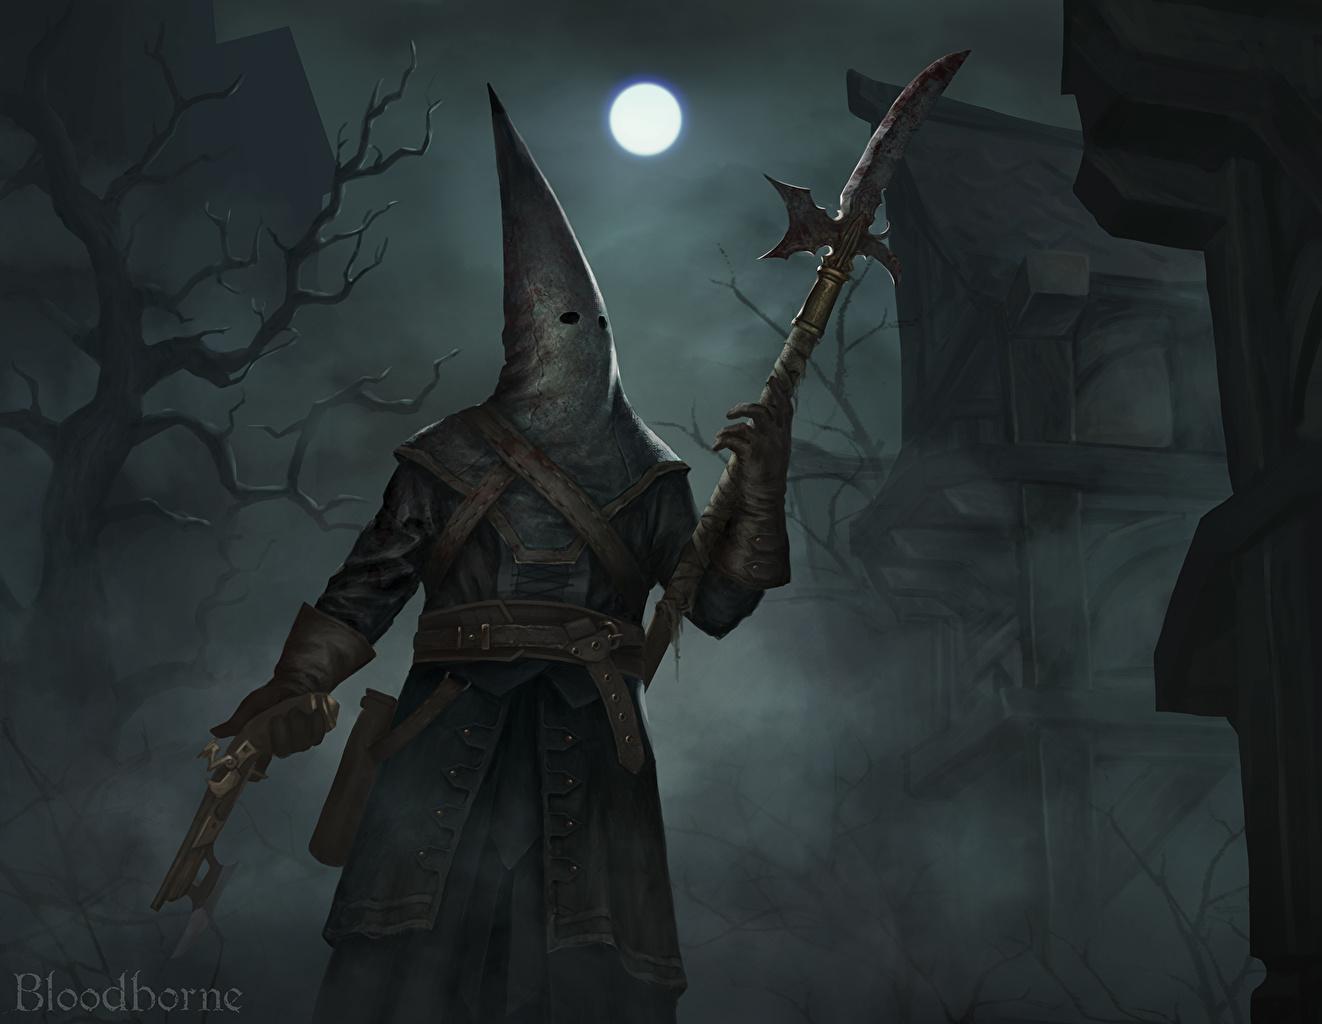 壁紙仮面dark Souls Bloodborne夜月ゲーム